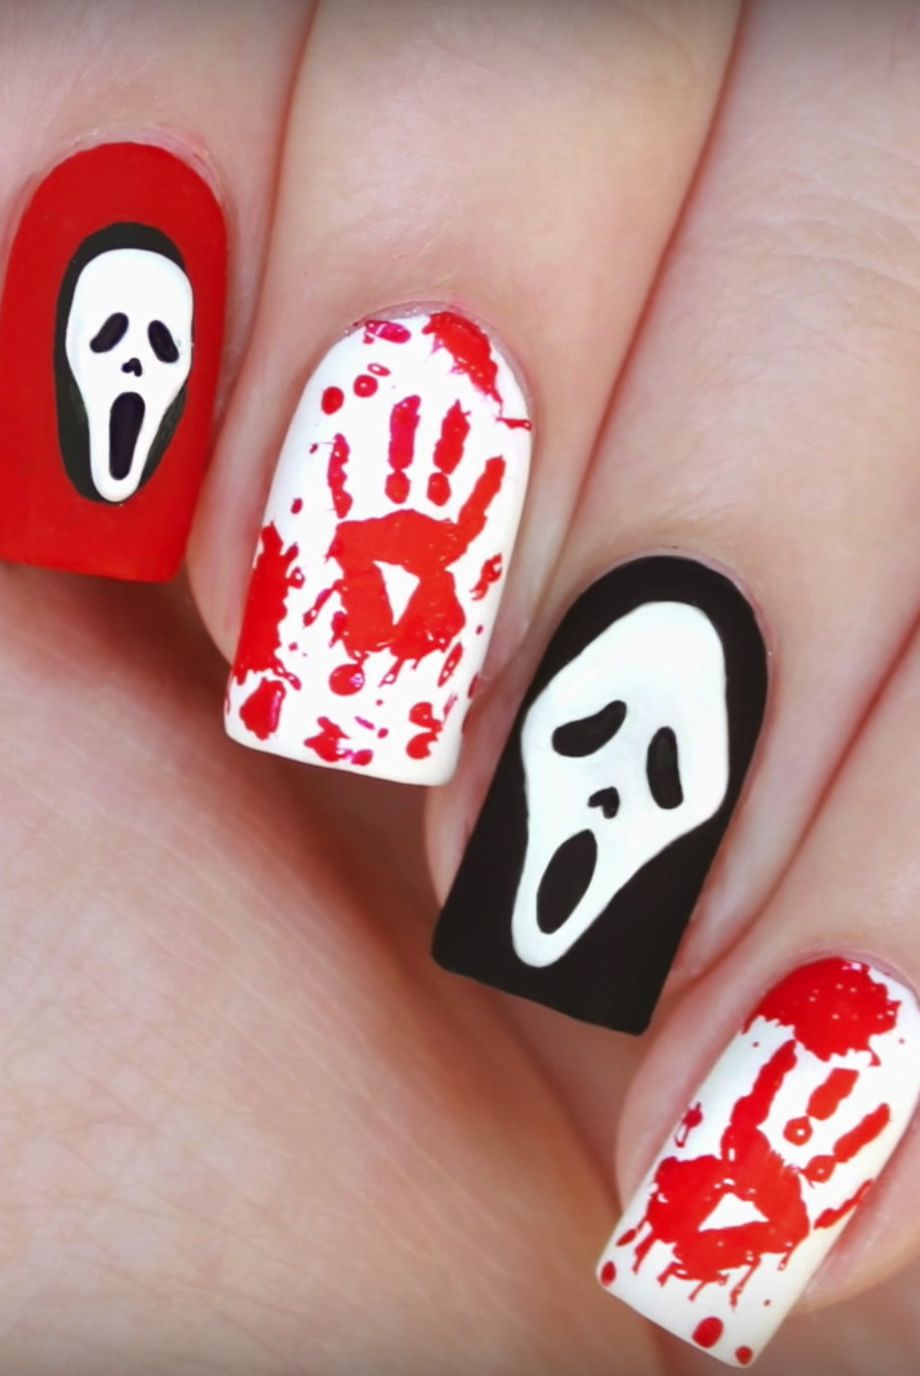 90+ DIY Halloween Nail Art Ideas to get that spooky affair ...